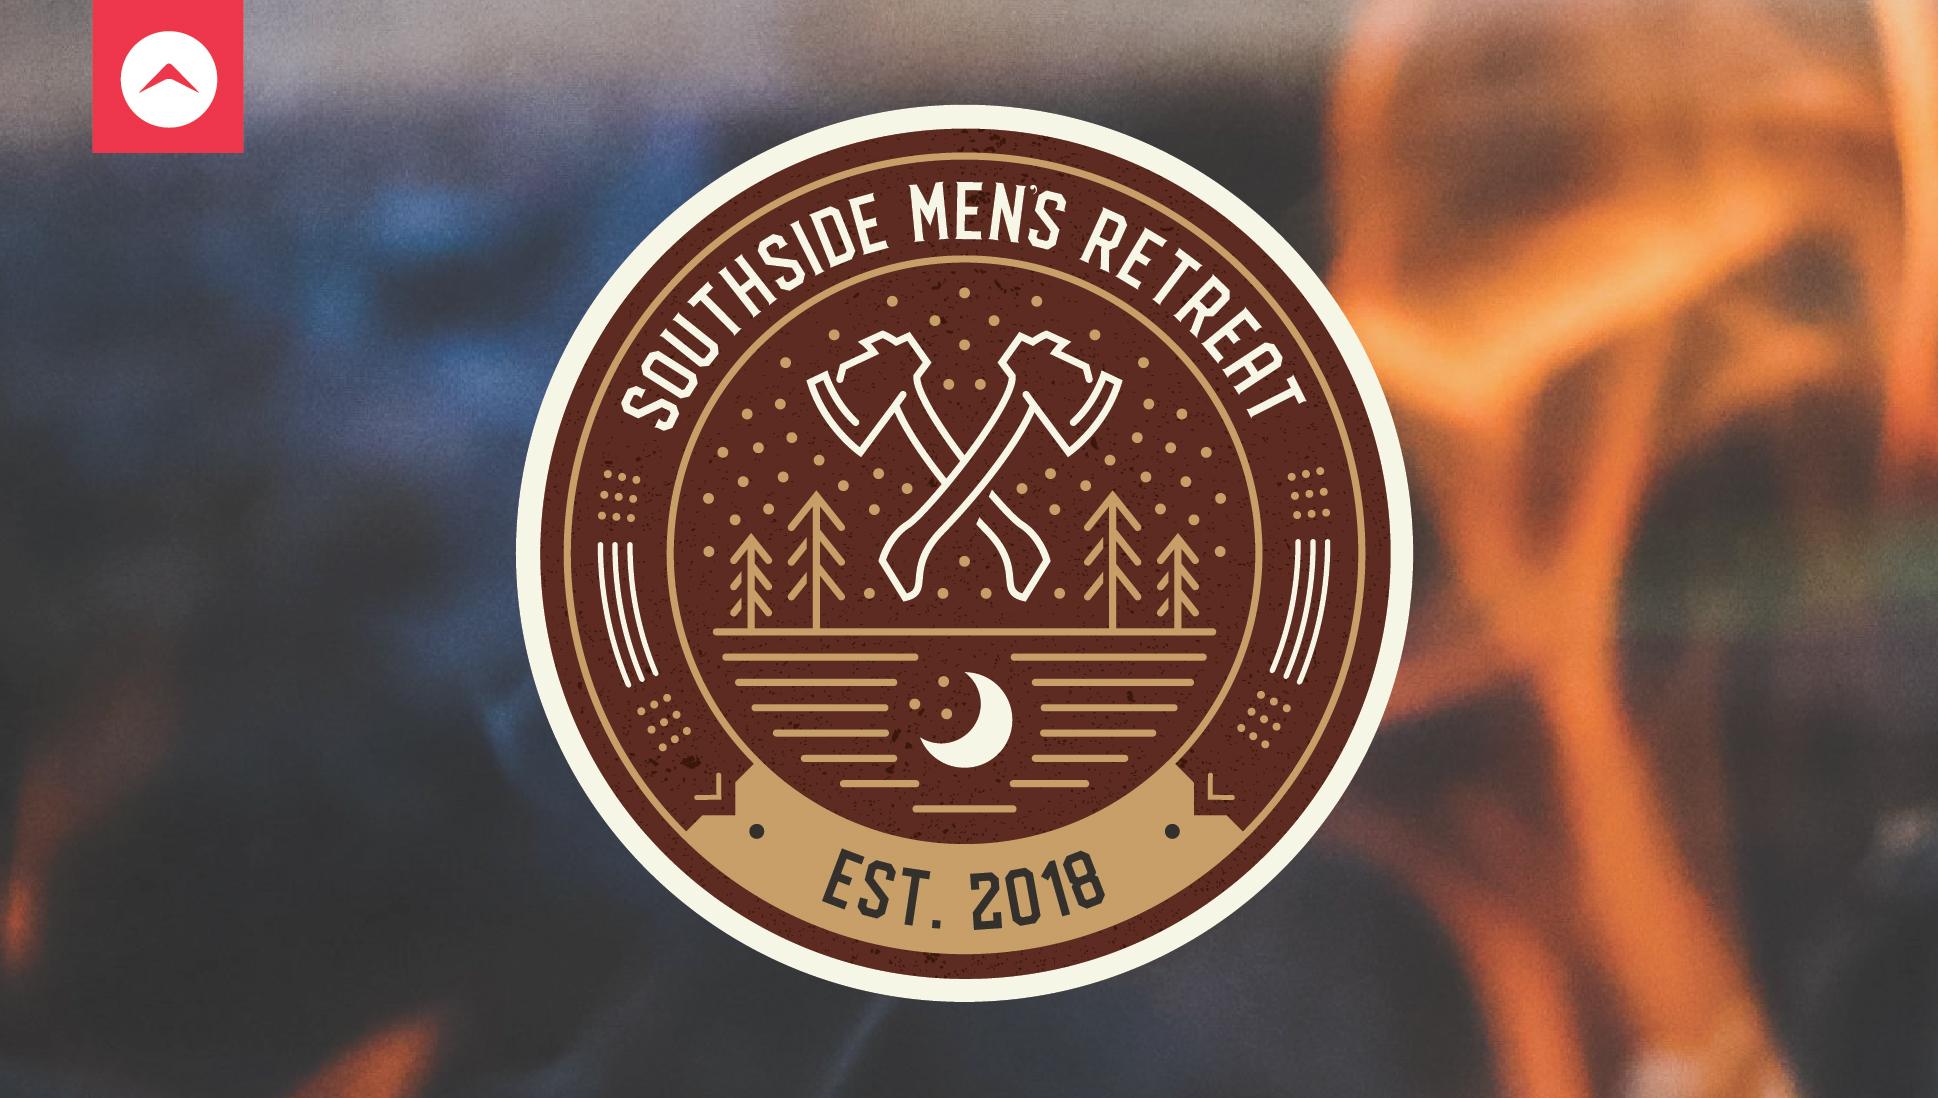 Mens retreat 01